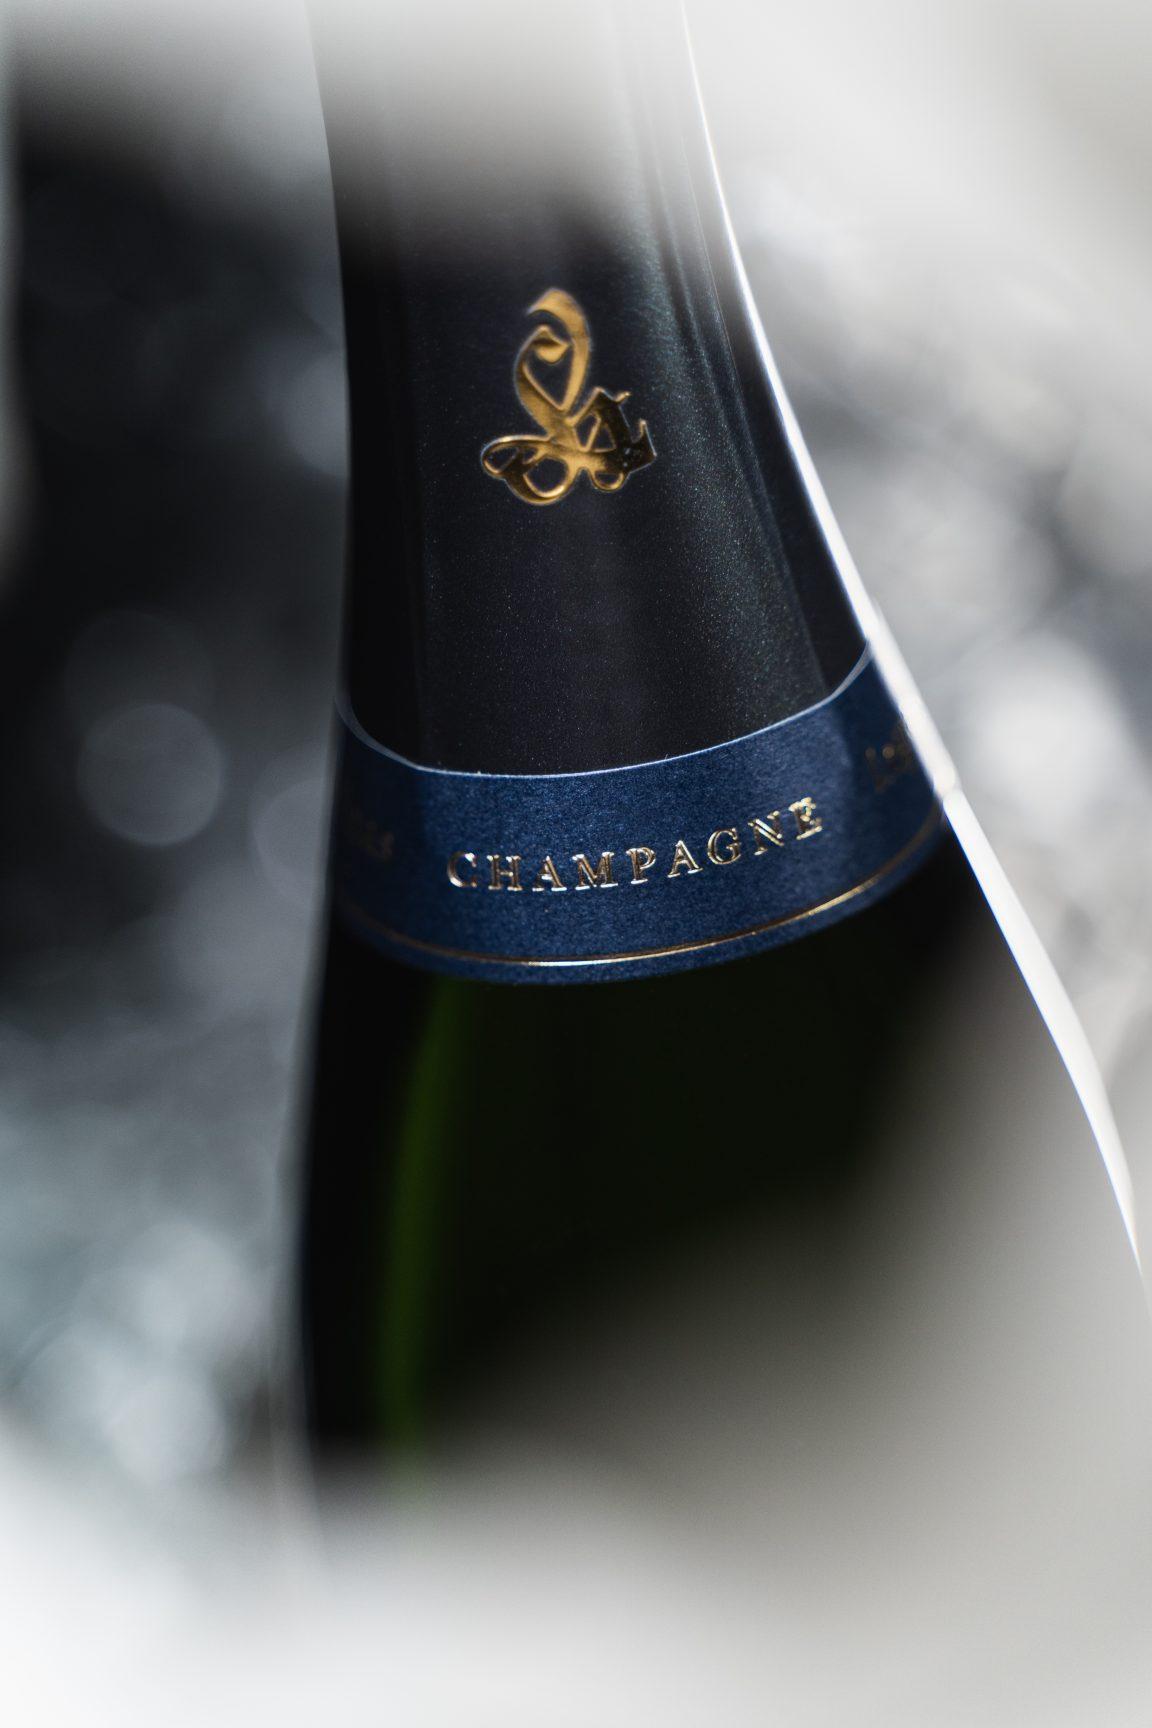 Blanc de Blancs Grand Cru 2012 - Champagne Legras & Haas